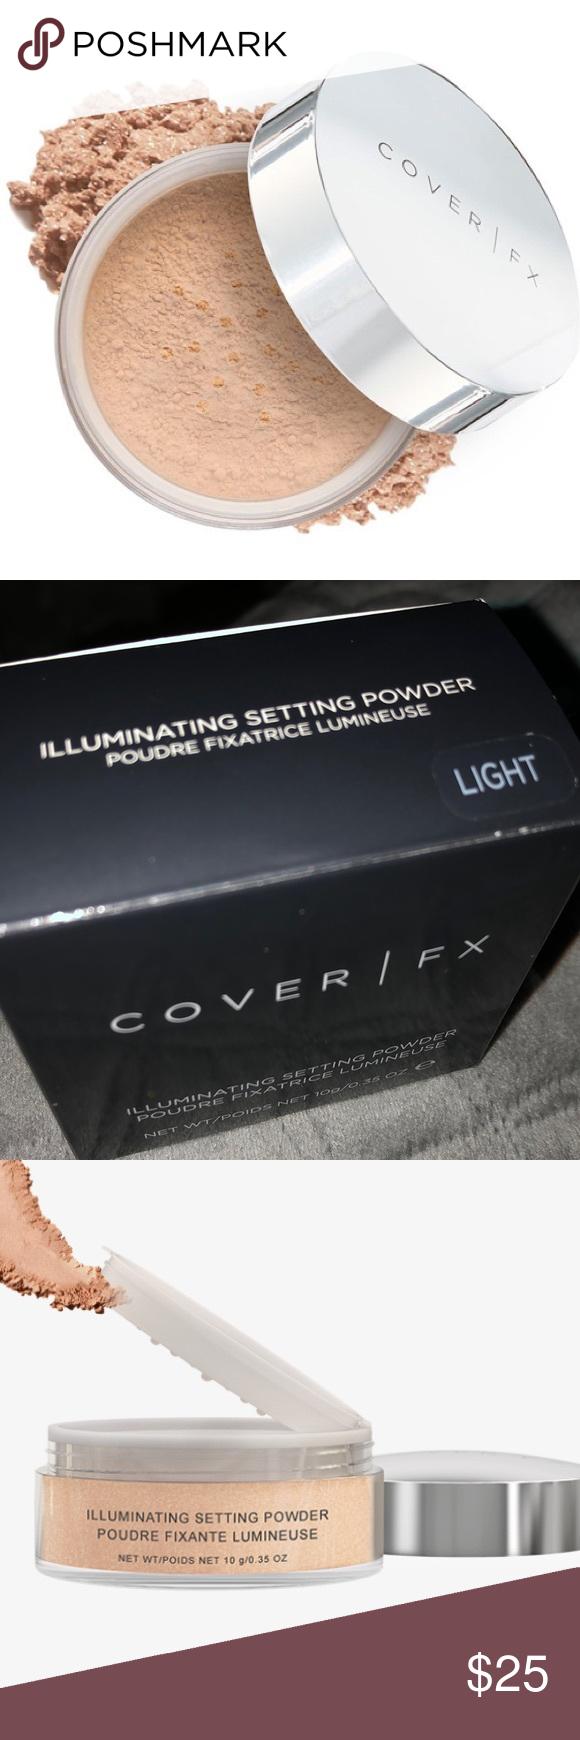 cover ғх ILLUMINATING SETTING POWDER LIGHT in 2020